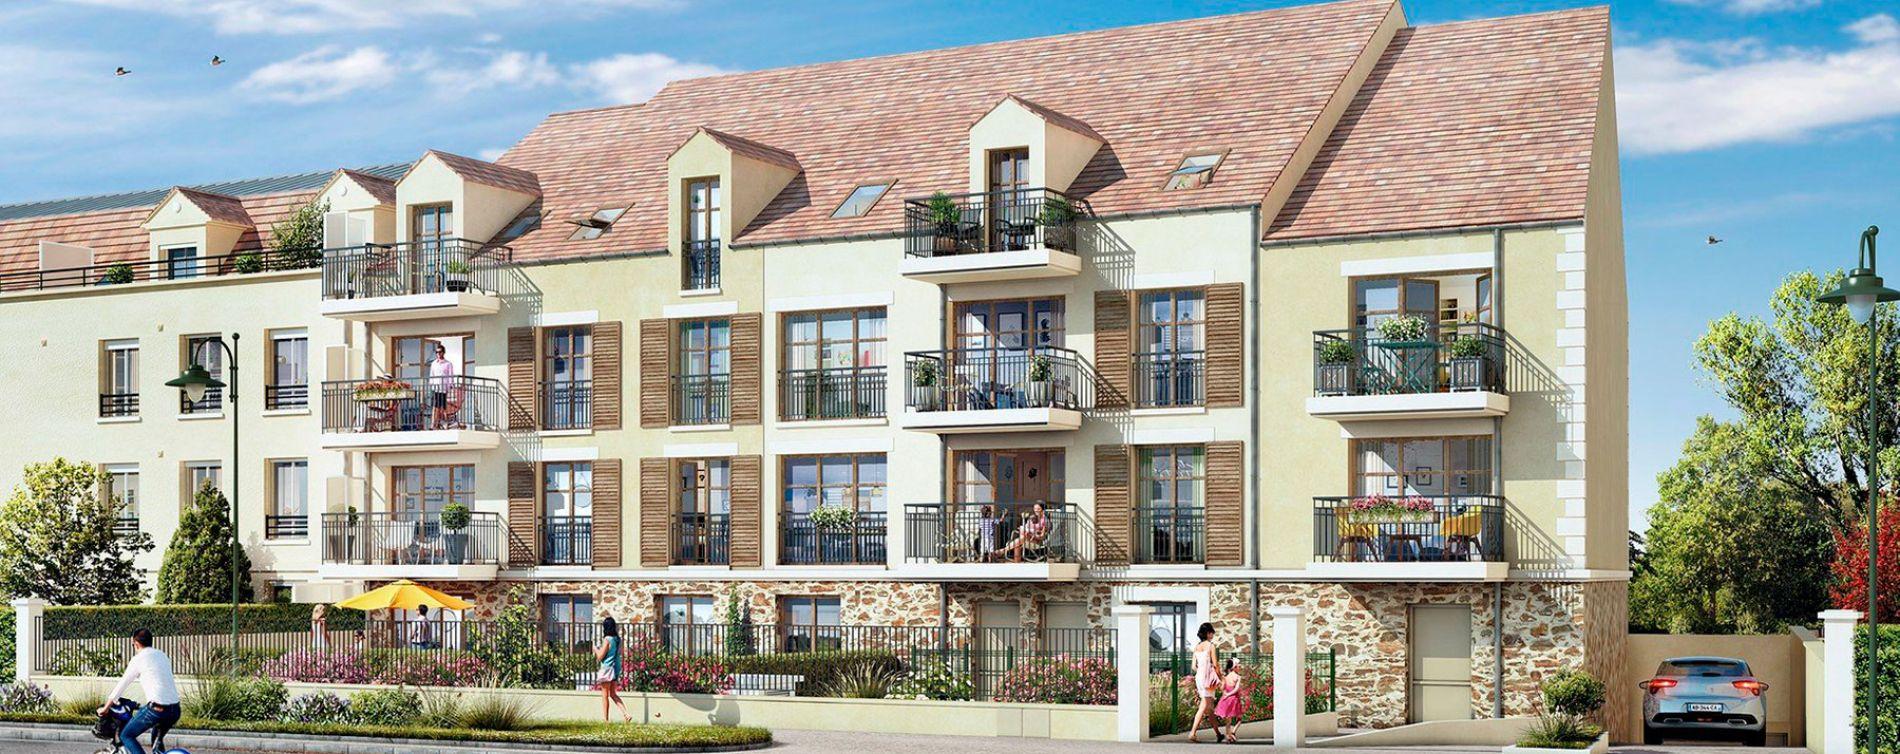 Lamorlaye : programme immobilier neuve « Villarmonie » en Loi Pinel